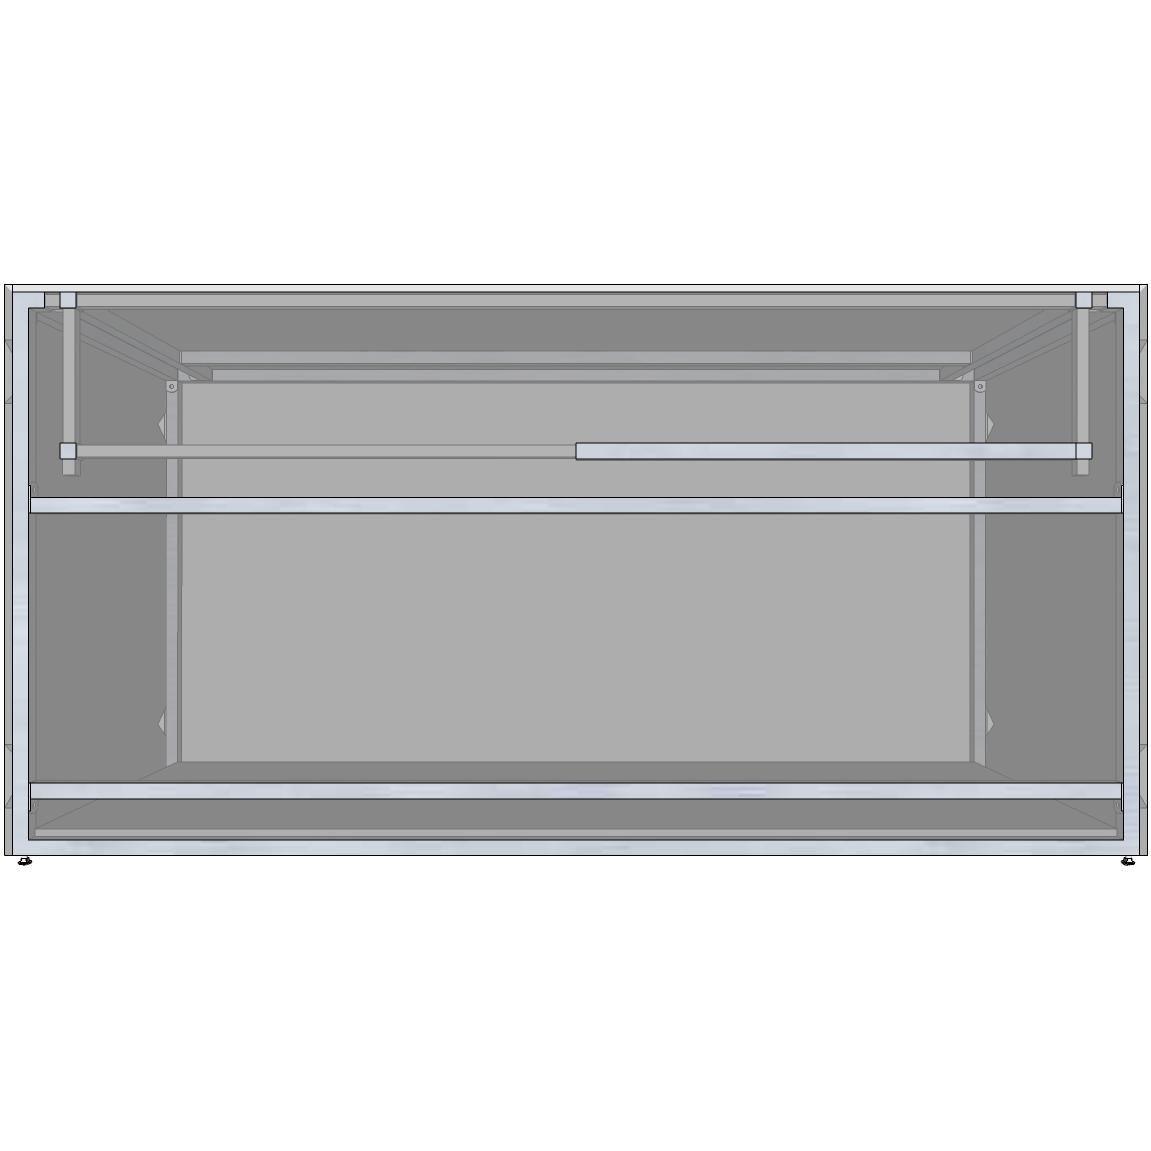 Rtf Systems Universal 72 Ready To Finish Bbq Island Appliance And Storage Cabinet Rtf72 29 Ac Outdoor Kitchen Kits Bbq Island Modular Cabinets